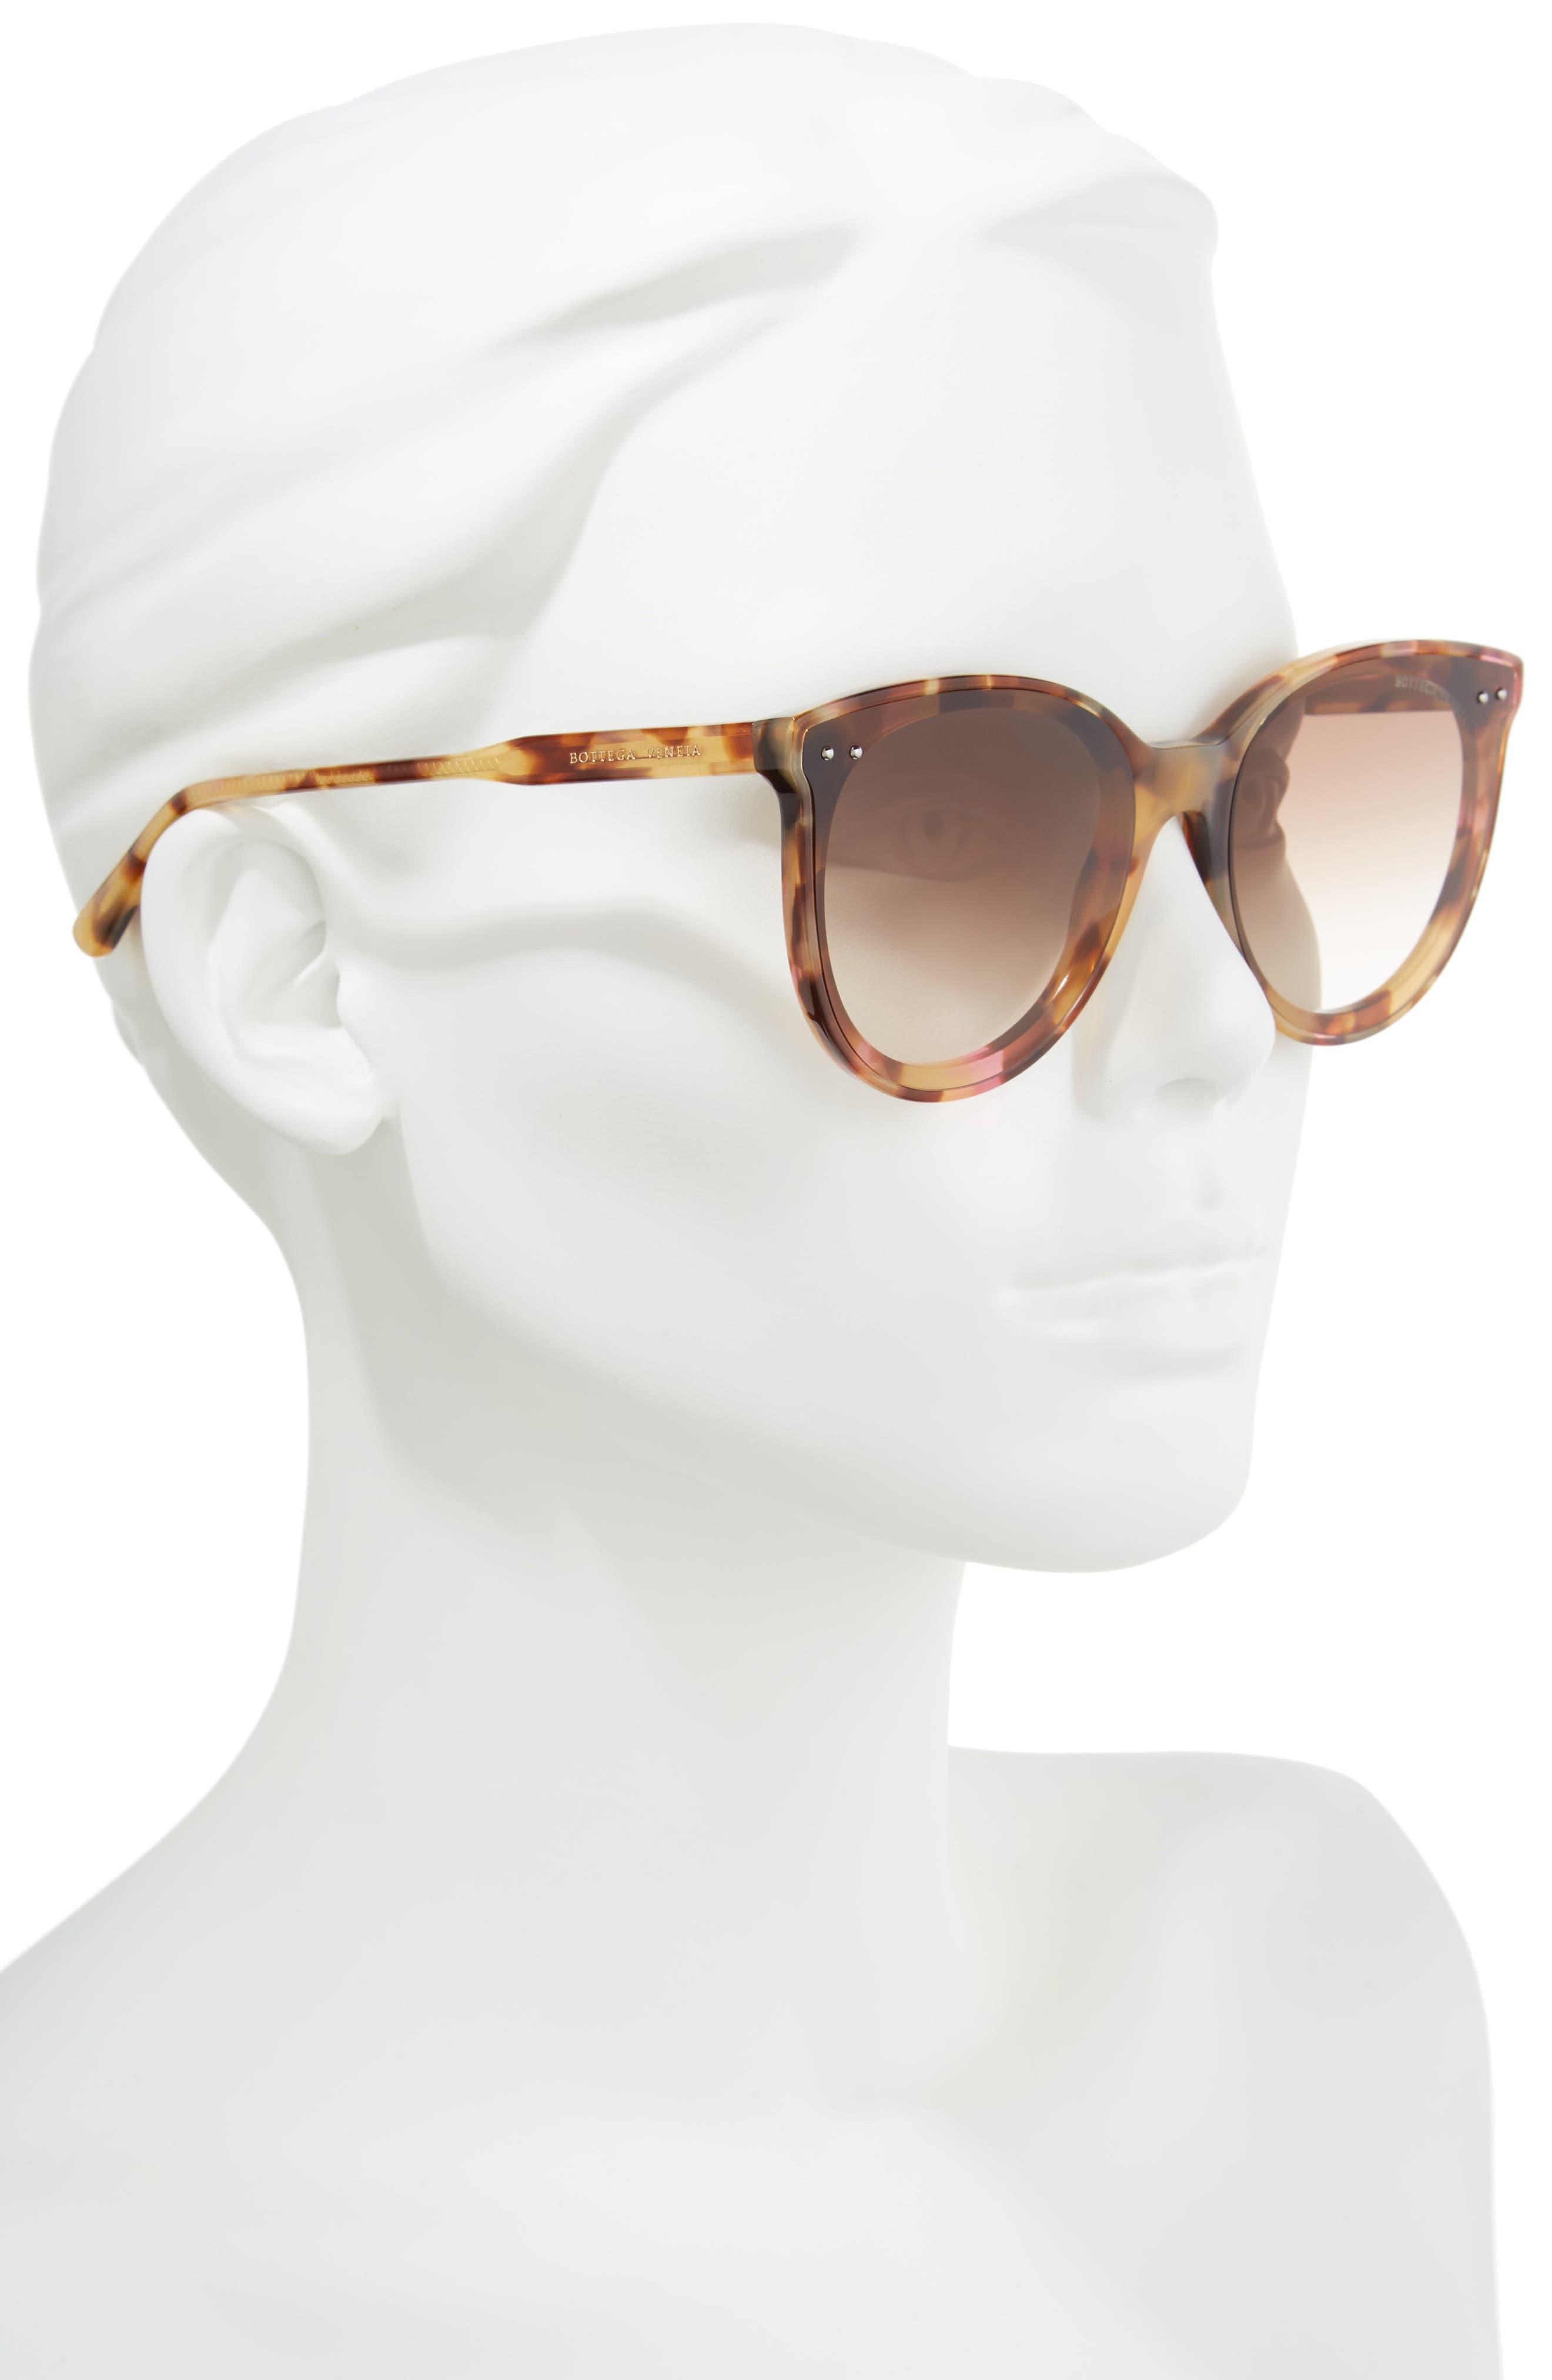 61mm Cat Eye Sunglasses,                             Alternate thumbnail 2, color,                             PINK HAVANA